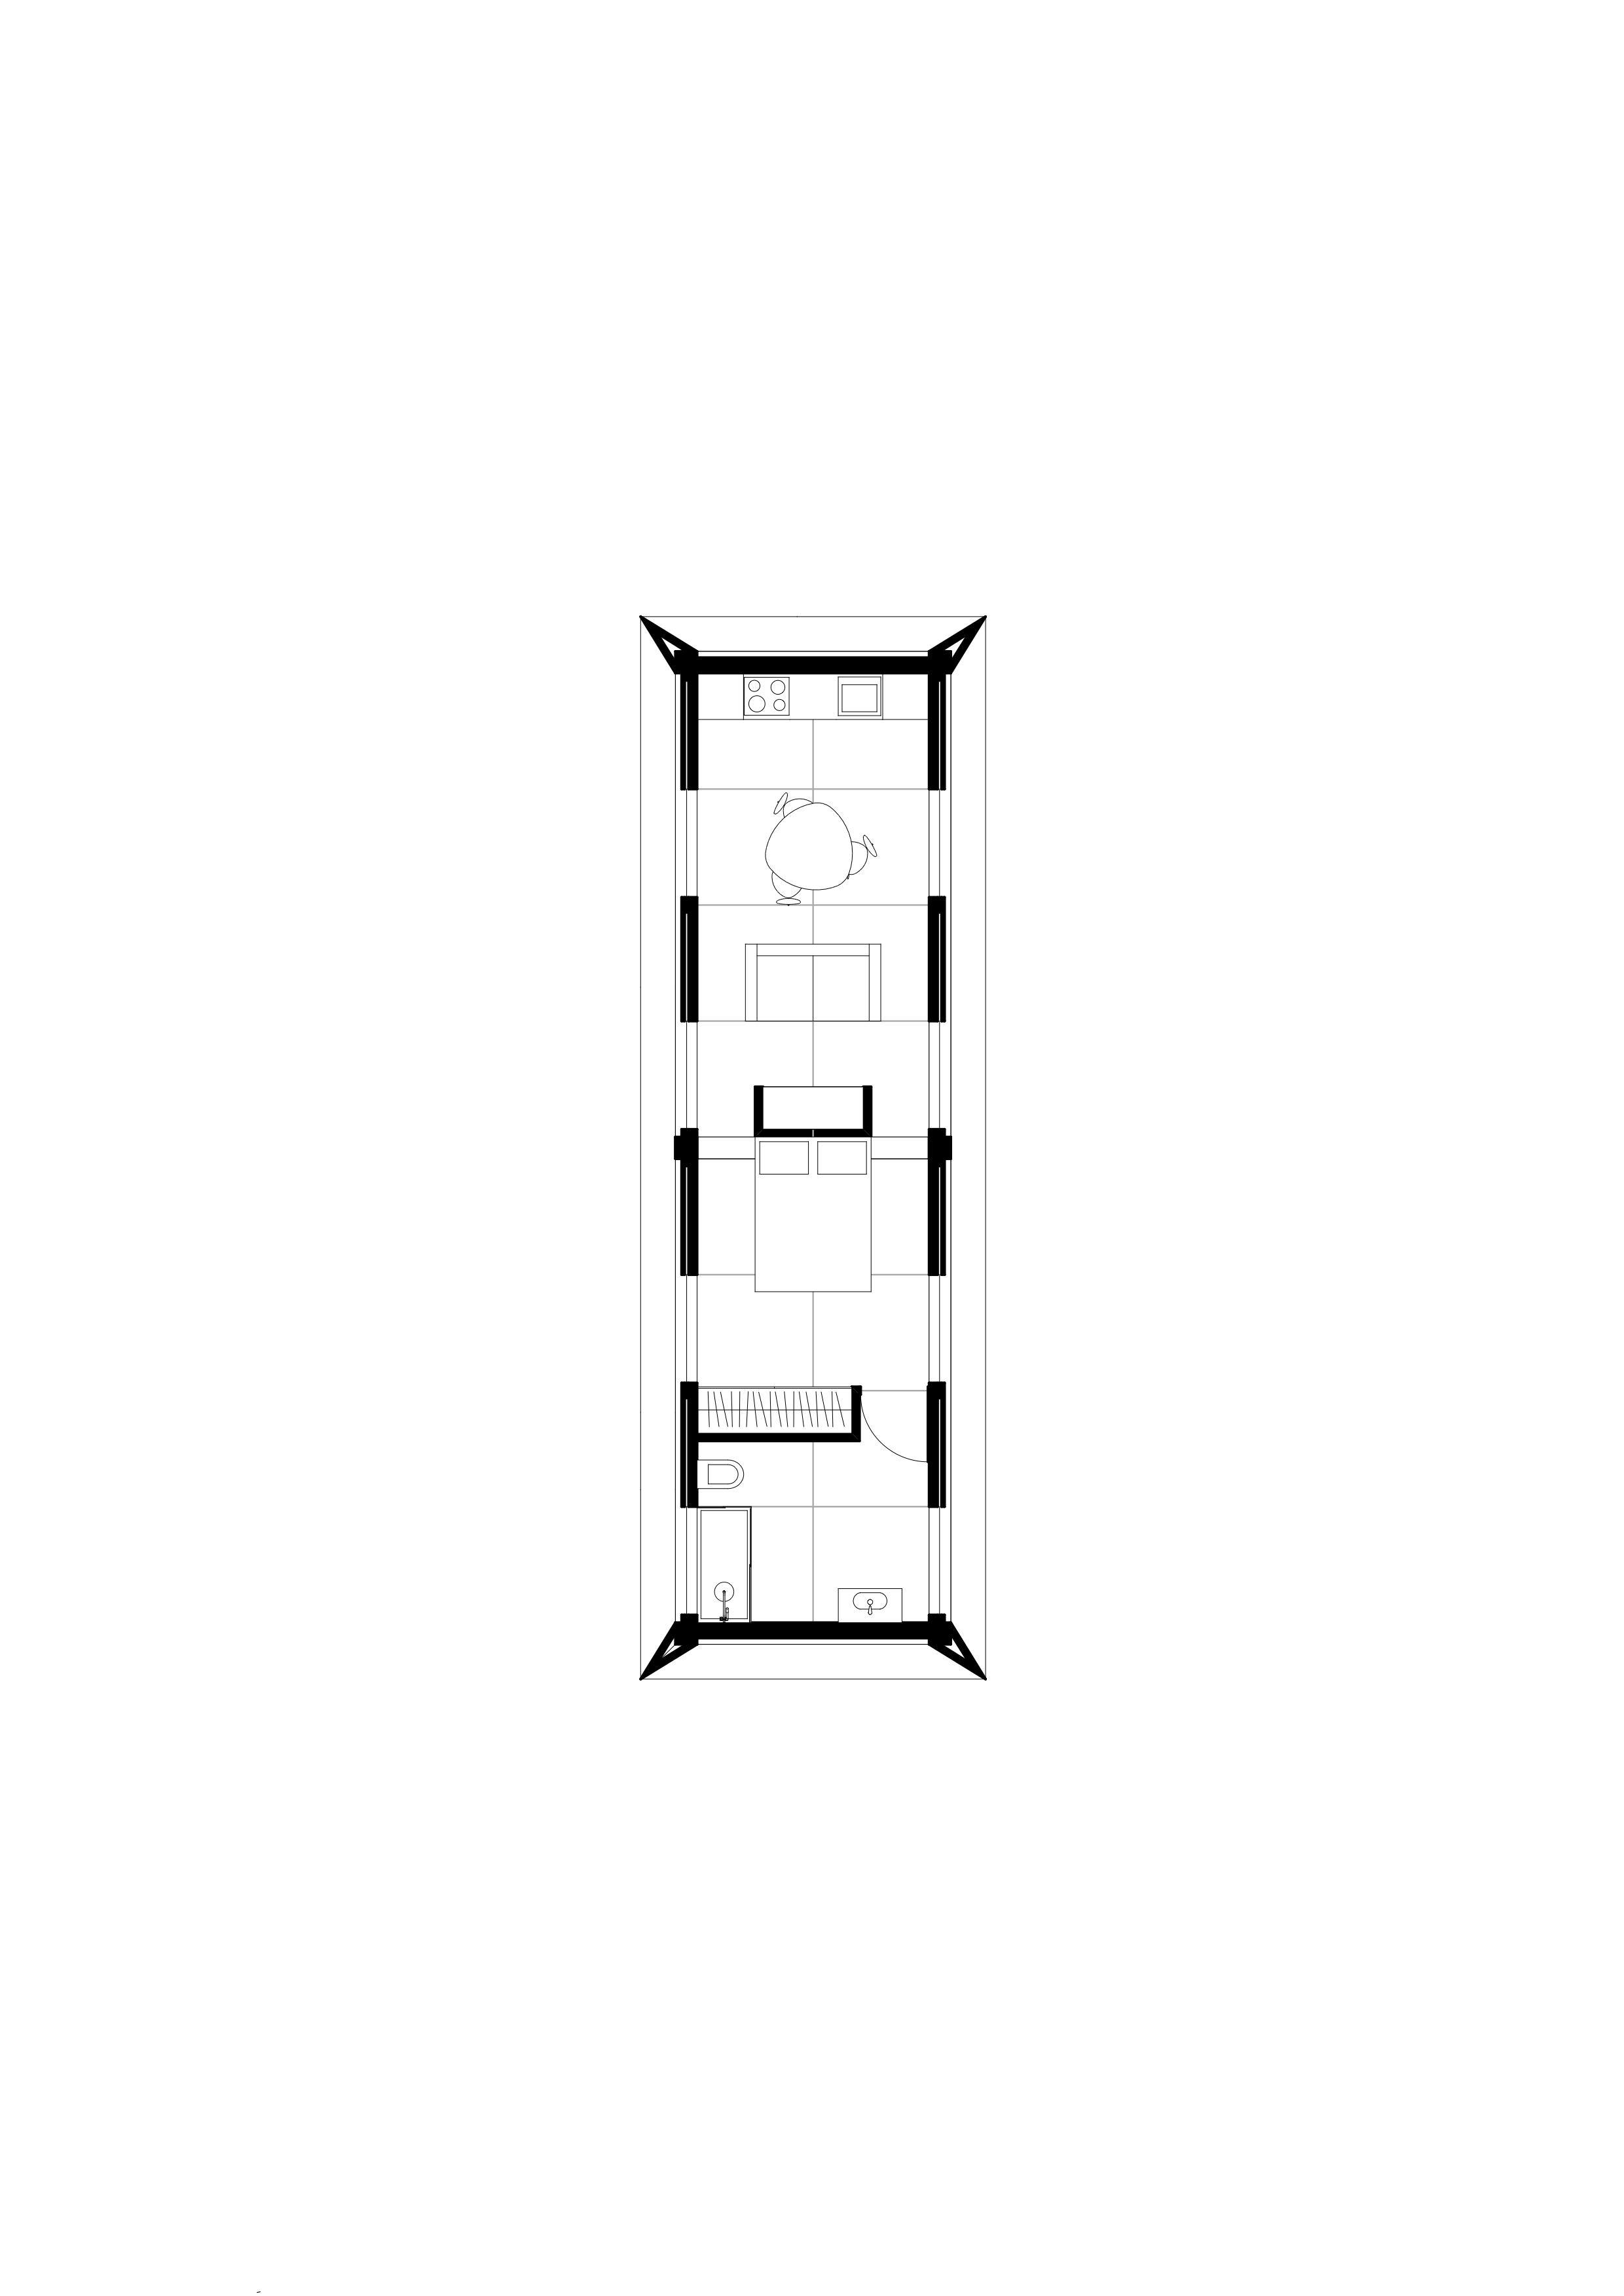 MIMA House Studio  Total Area 61m2